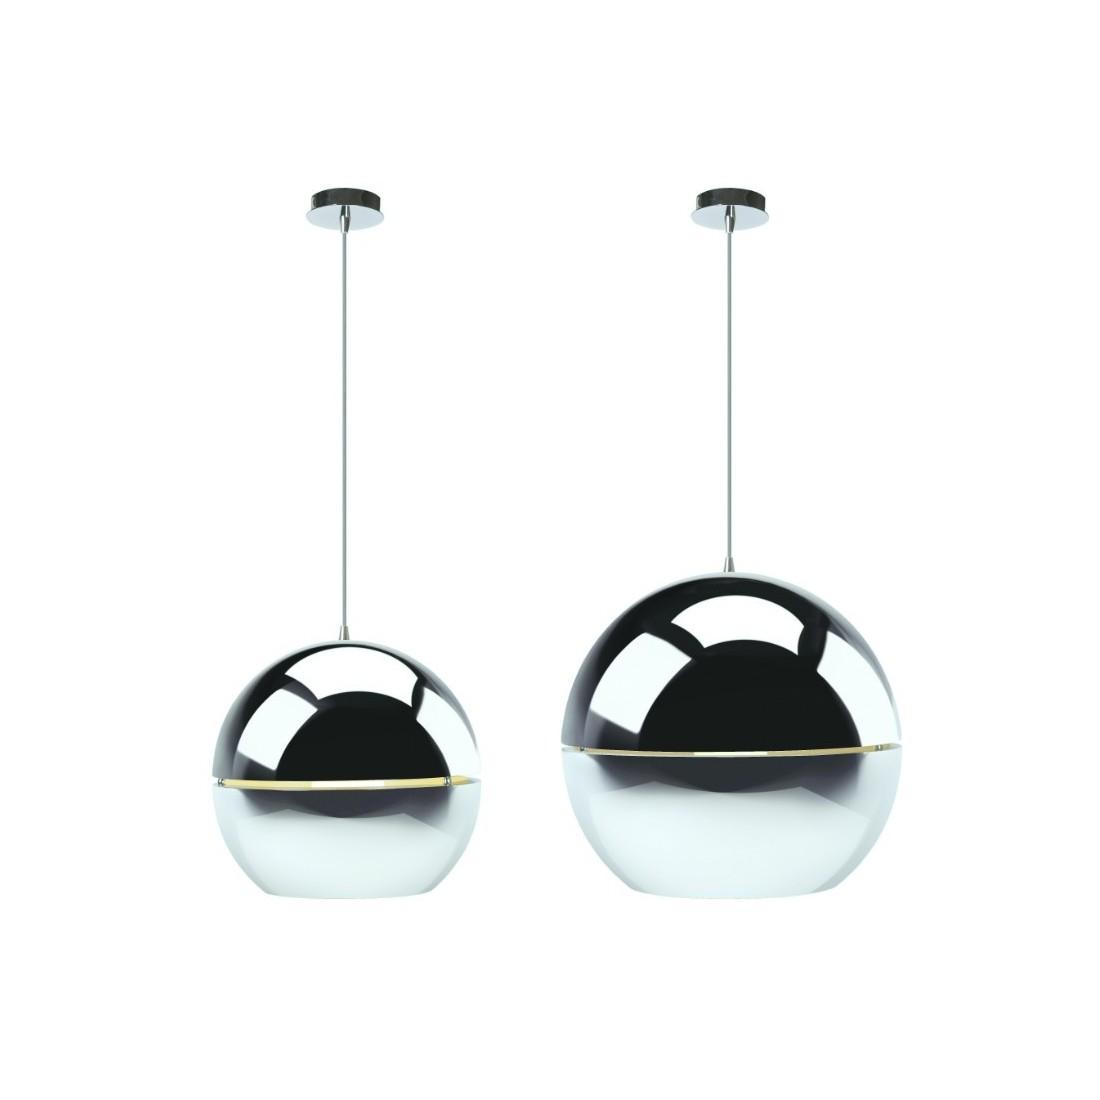 Suspensions retro chrome zuiver s 39 est inspir des ann es - Manieres creer decor inspire annees ...